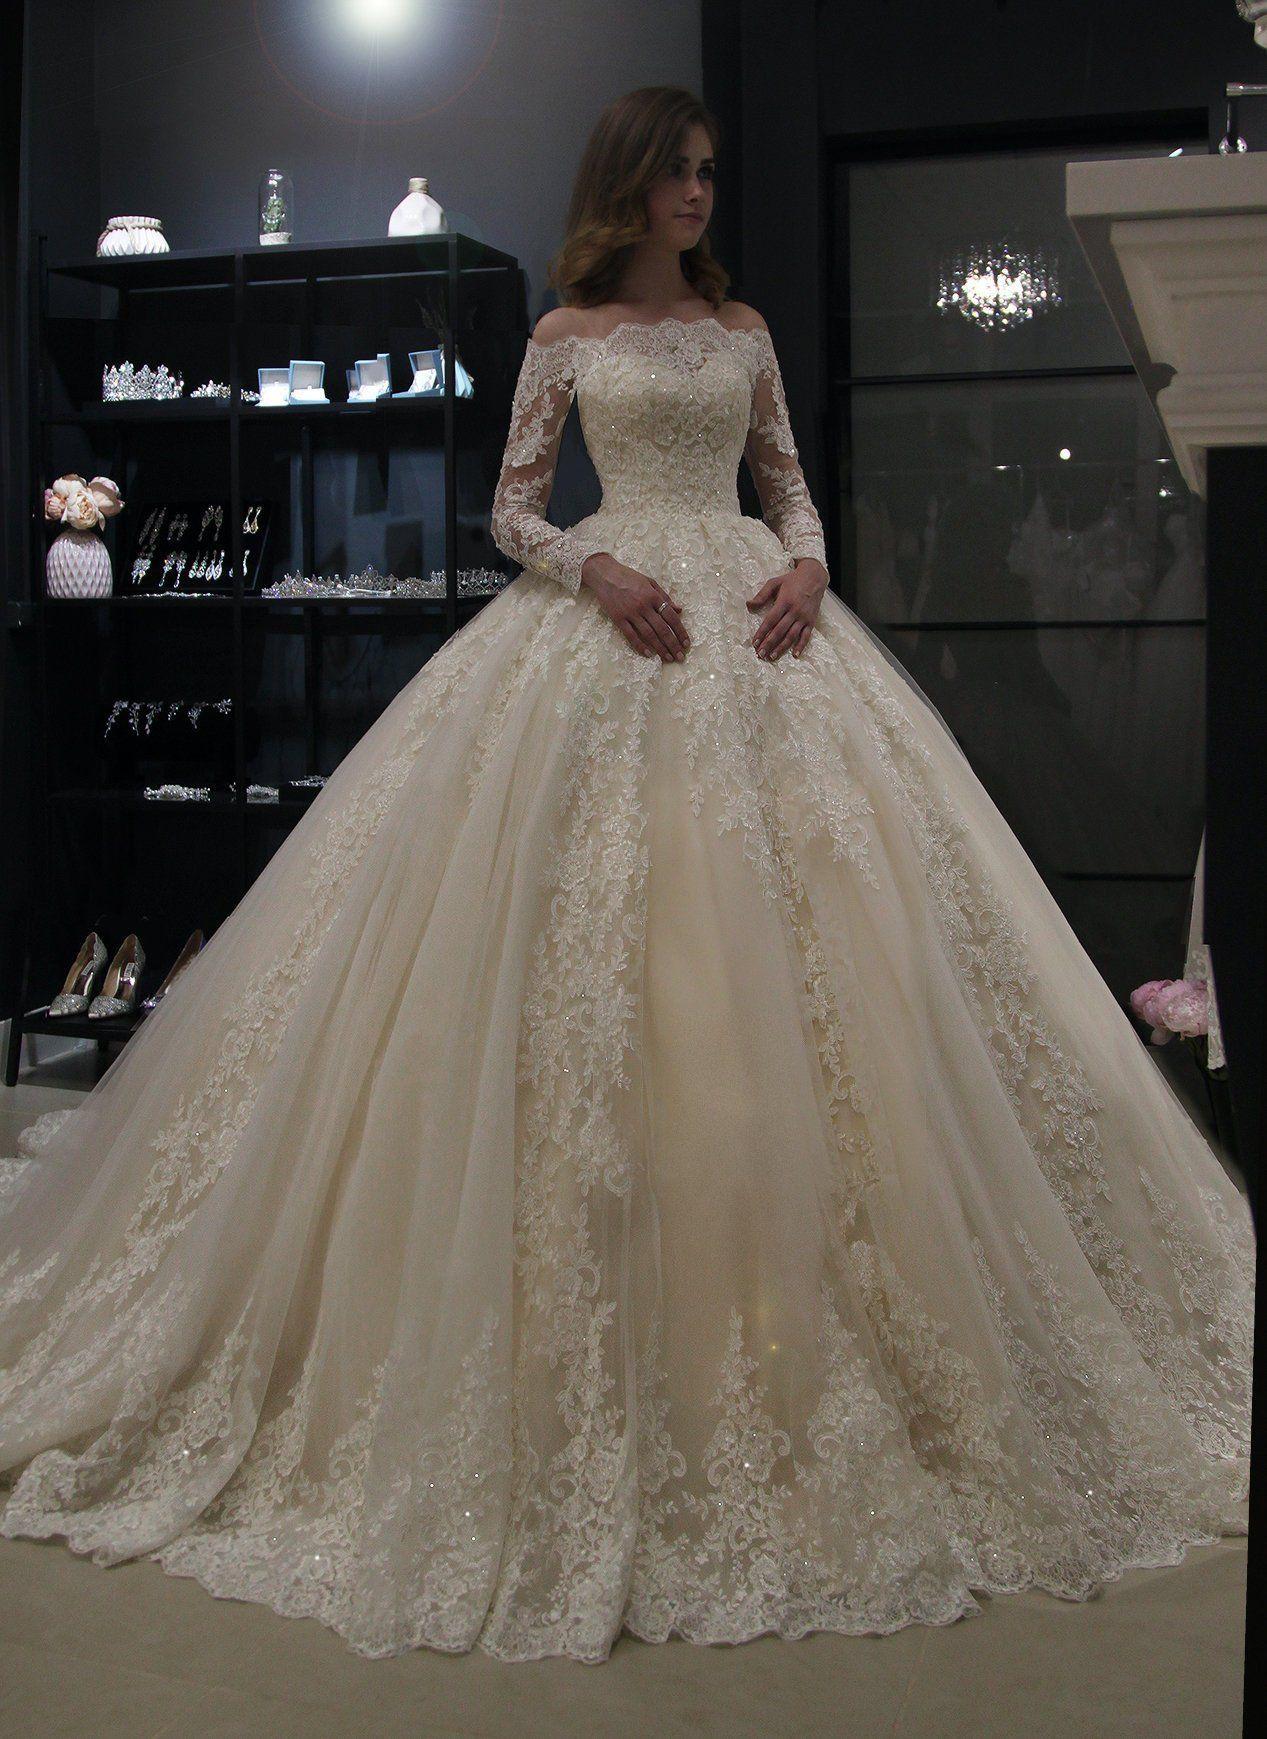 Pin by Jįňö on Wedding  Off shoulder wedding dress, Ball gowns